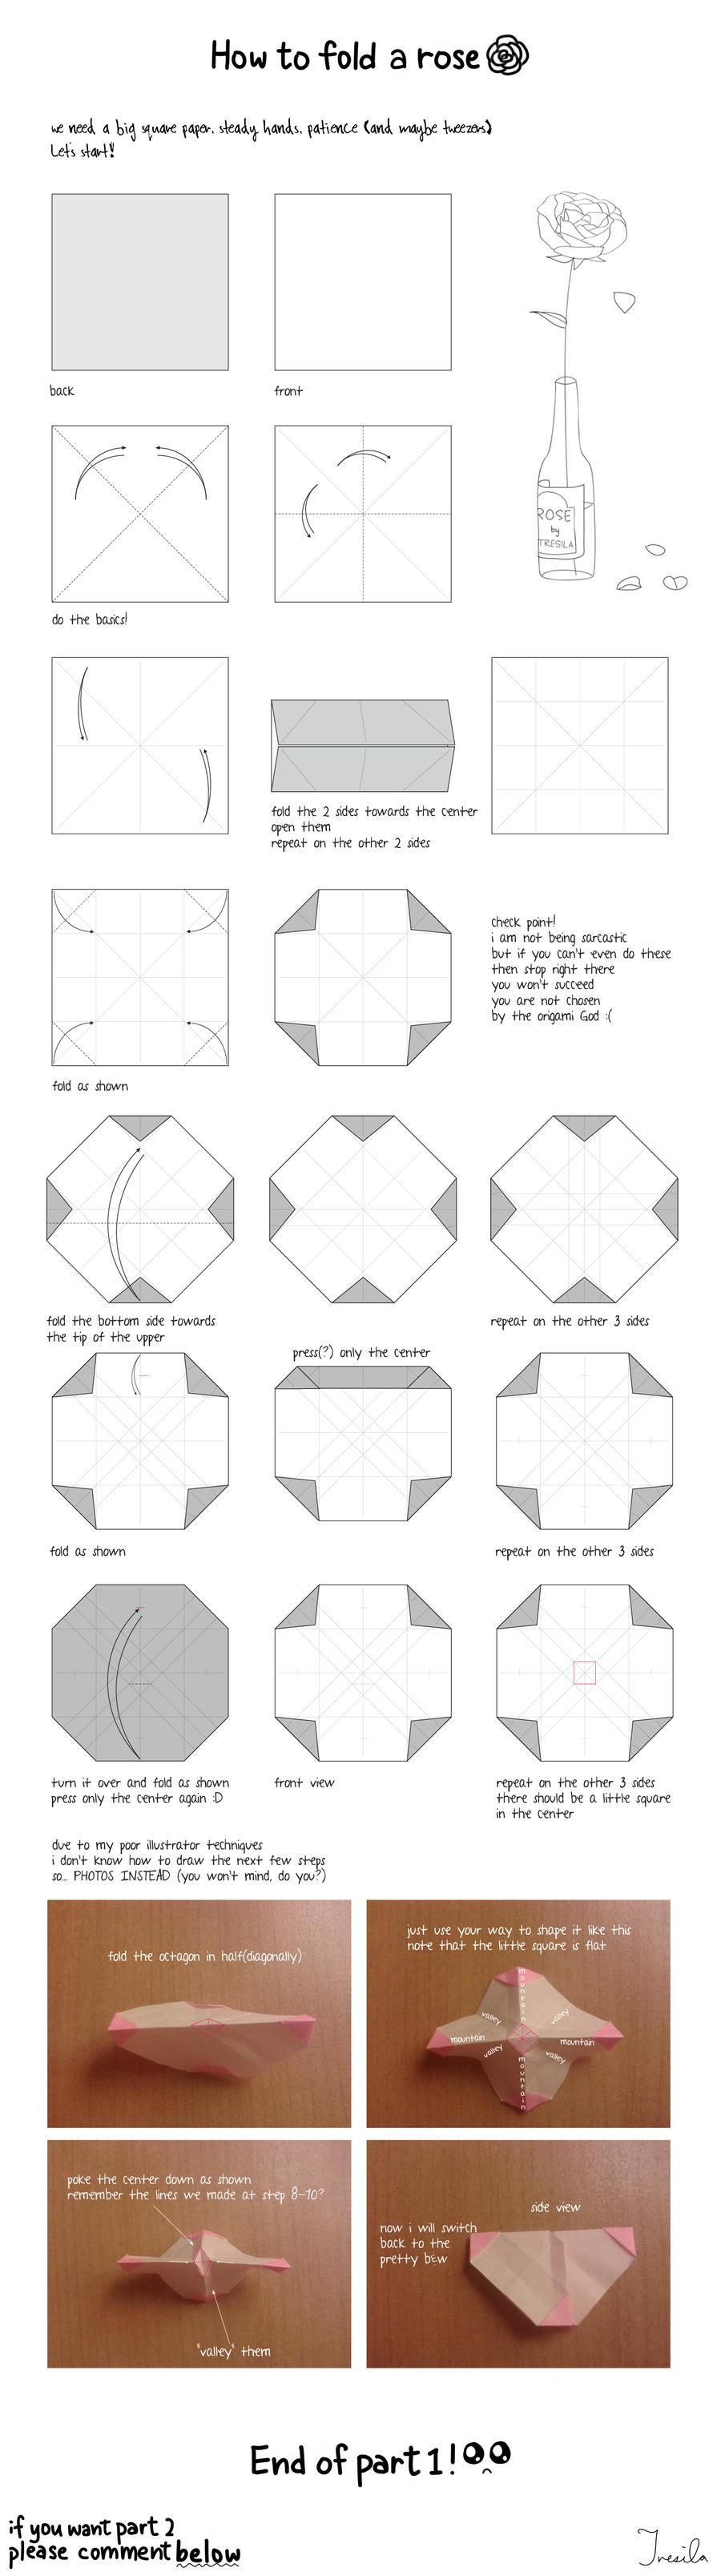 kawasaki rose tutorial part 1 by sandra 1987 on deviantart rh deviantart com new kawasaki rose diagram Origami Kawasaki Rose